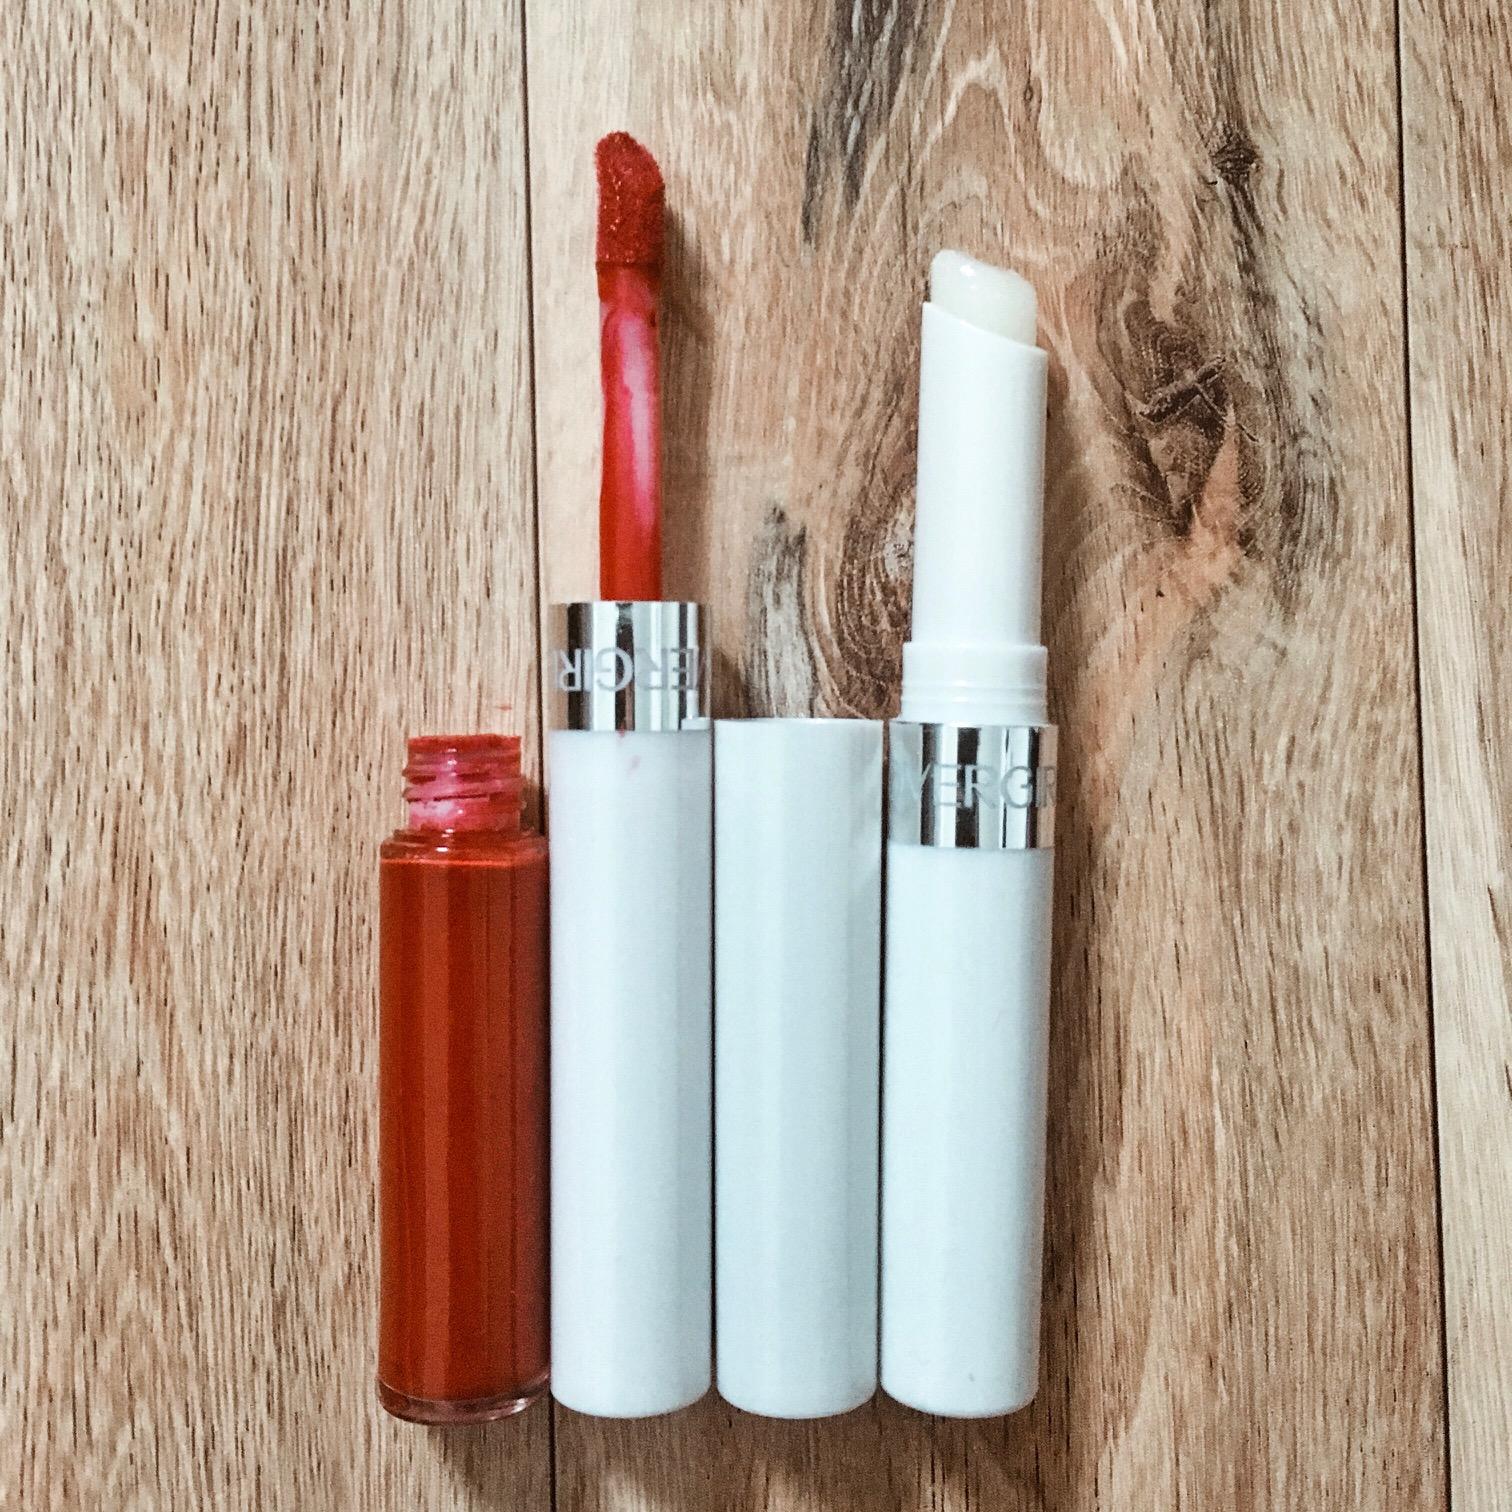 cruelty free lipsticks